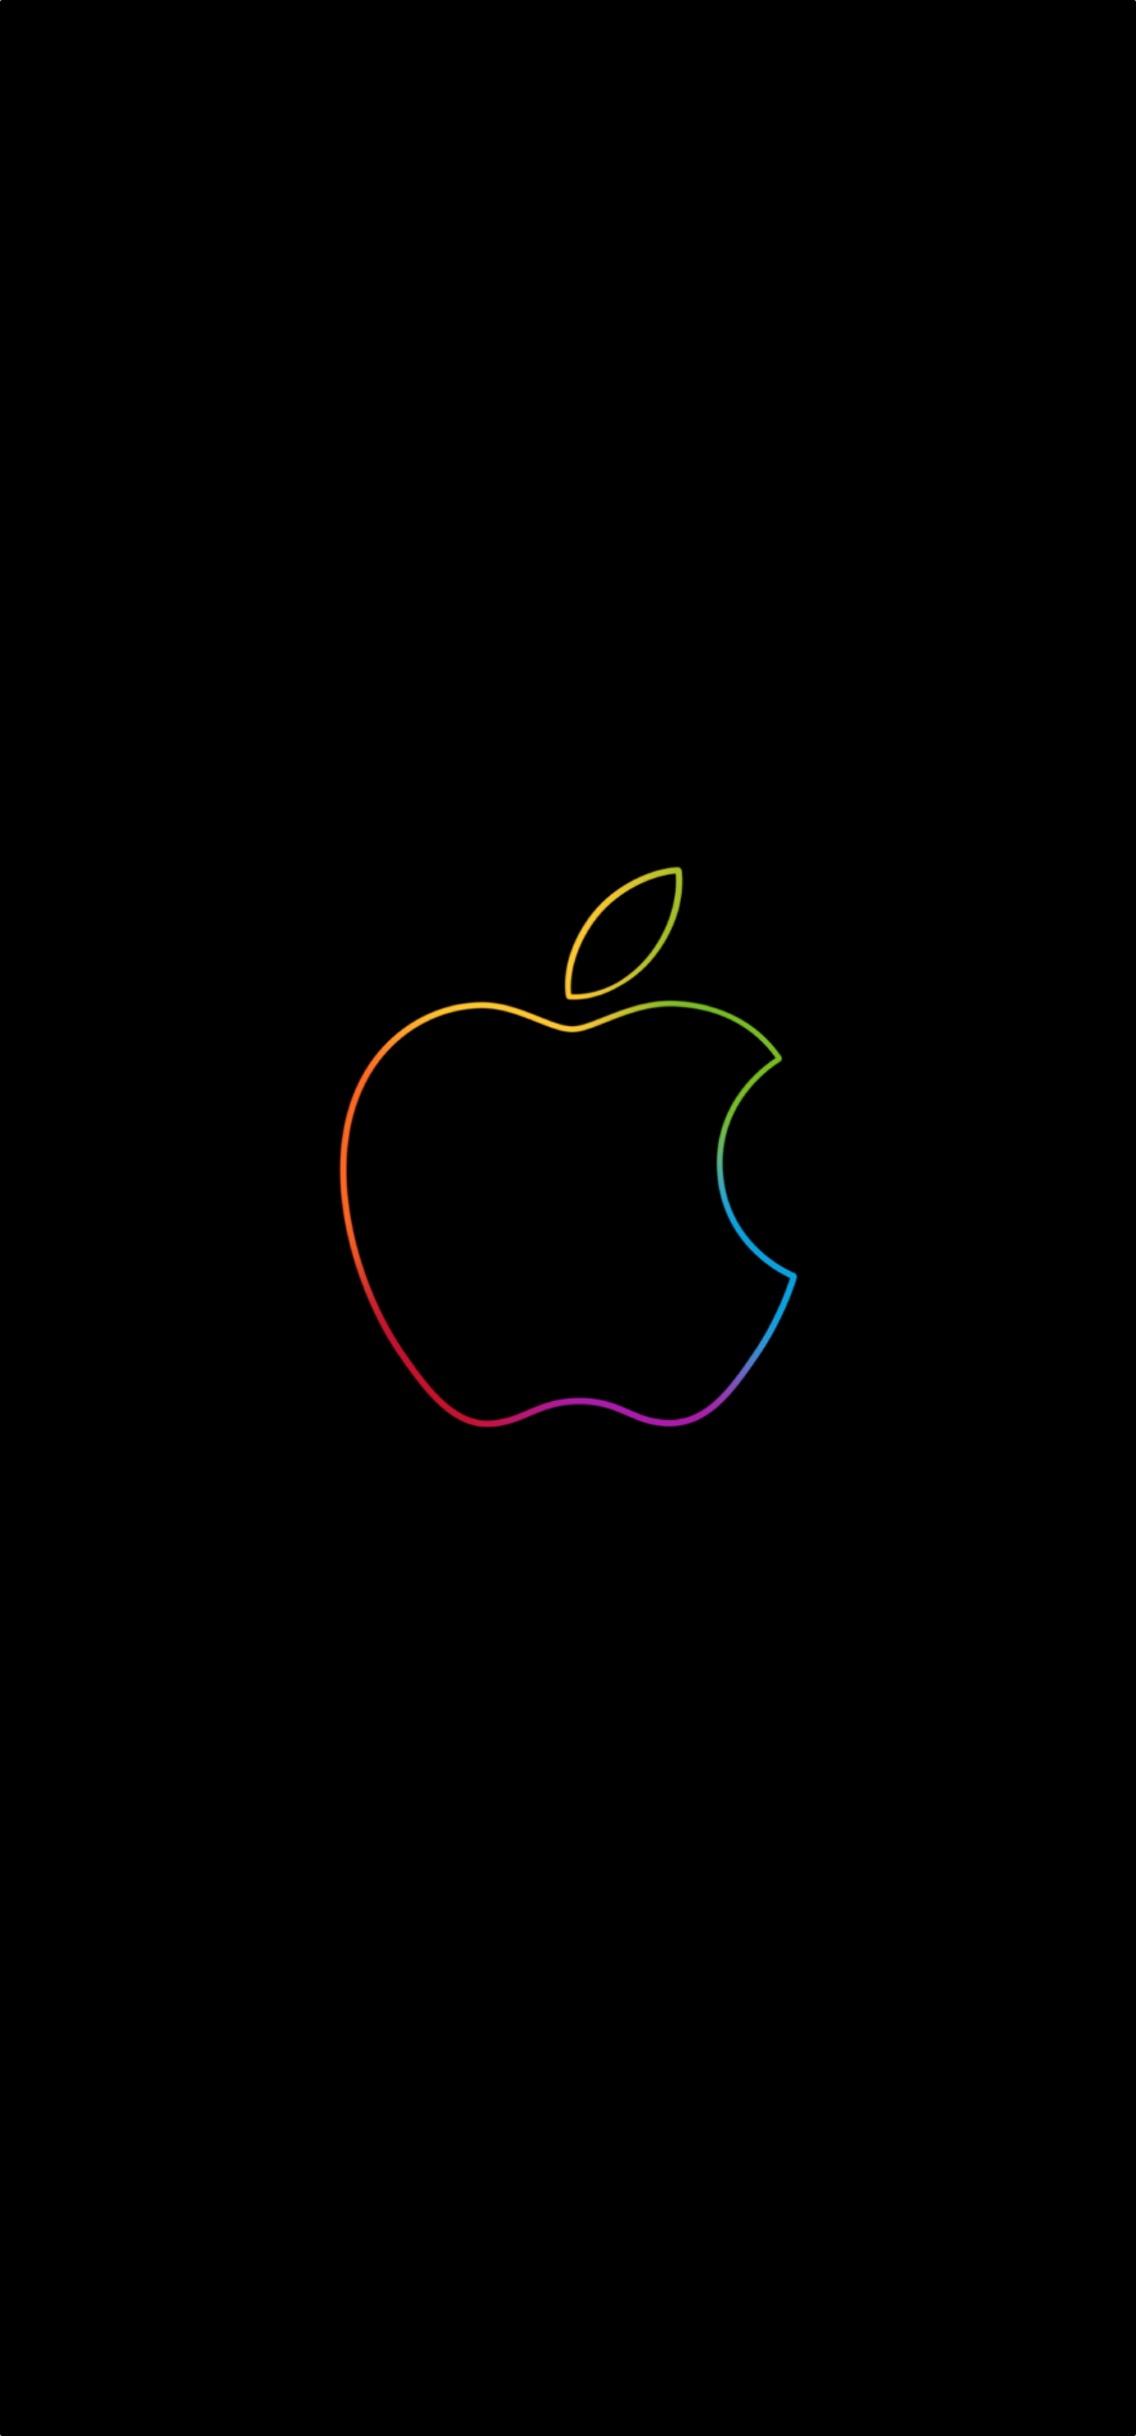 Iphone Xr Wallpaper Apple Logo Wallpaper Portrait